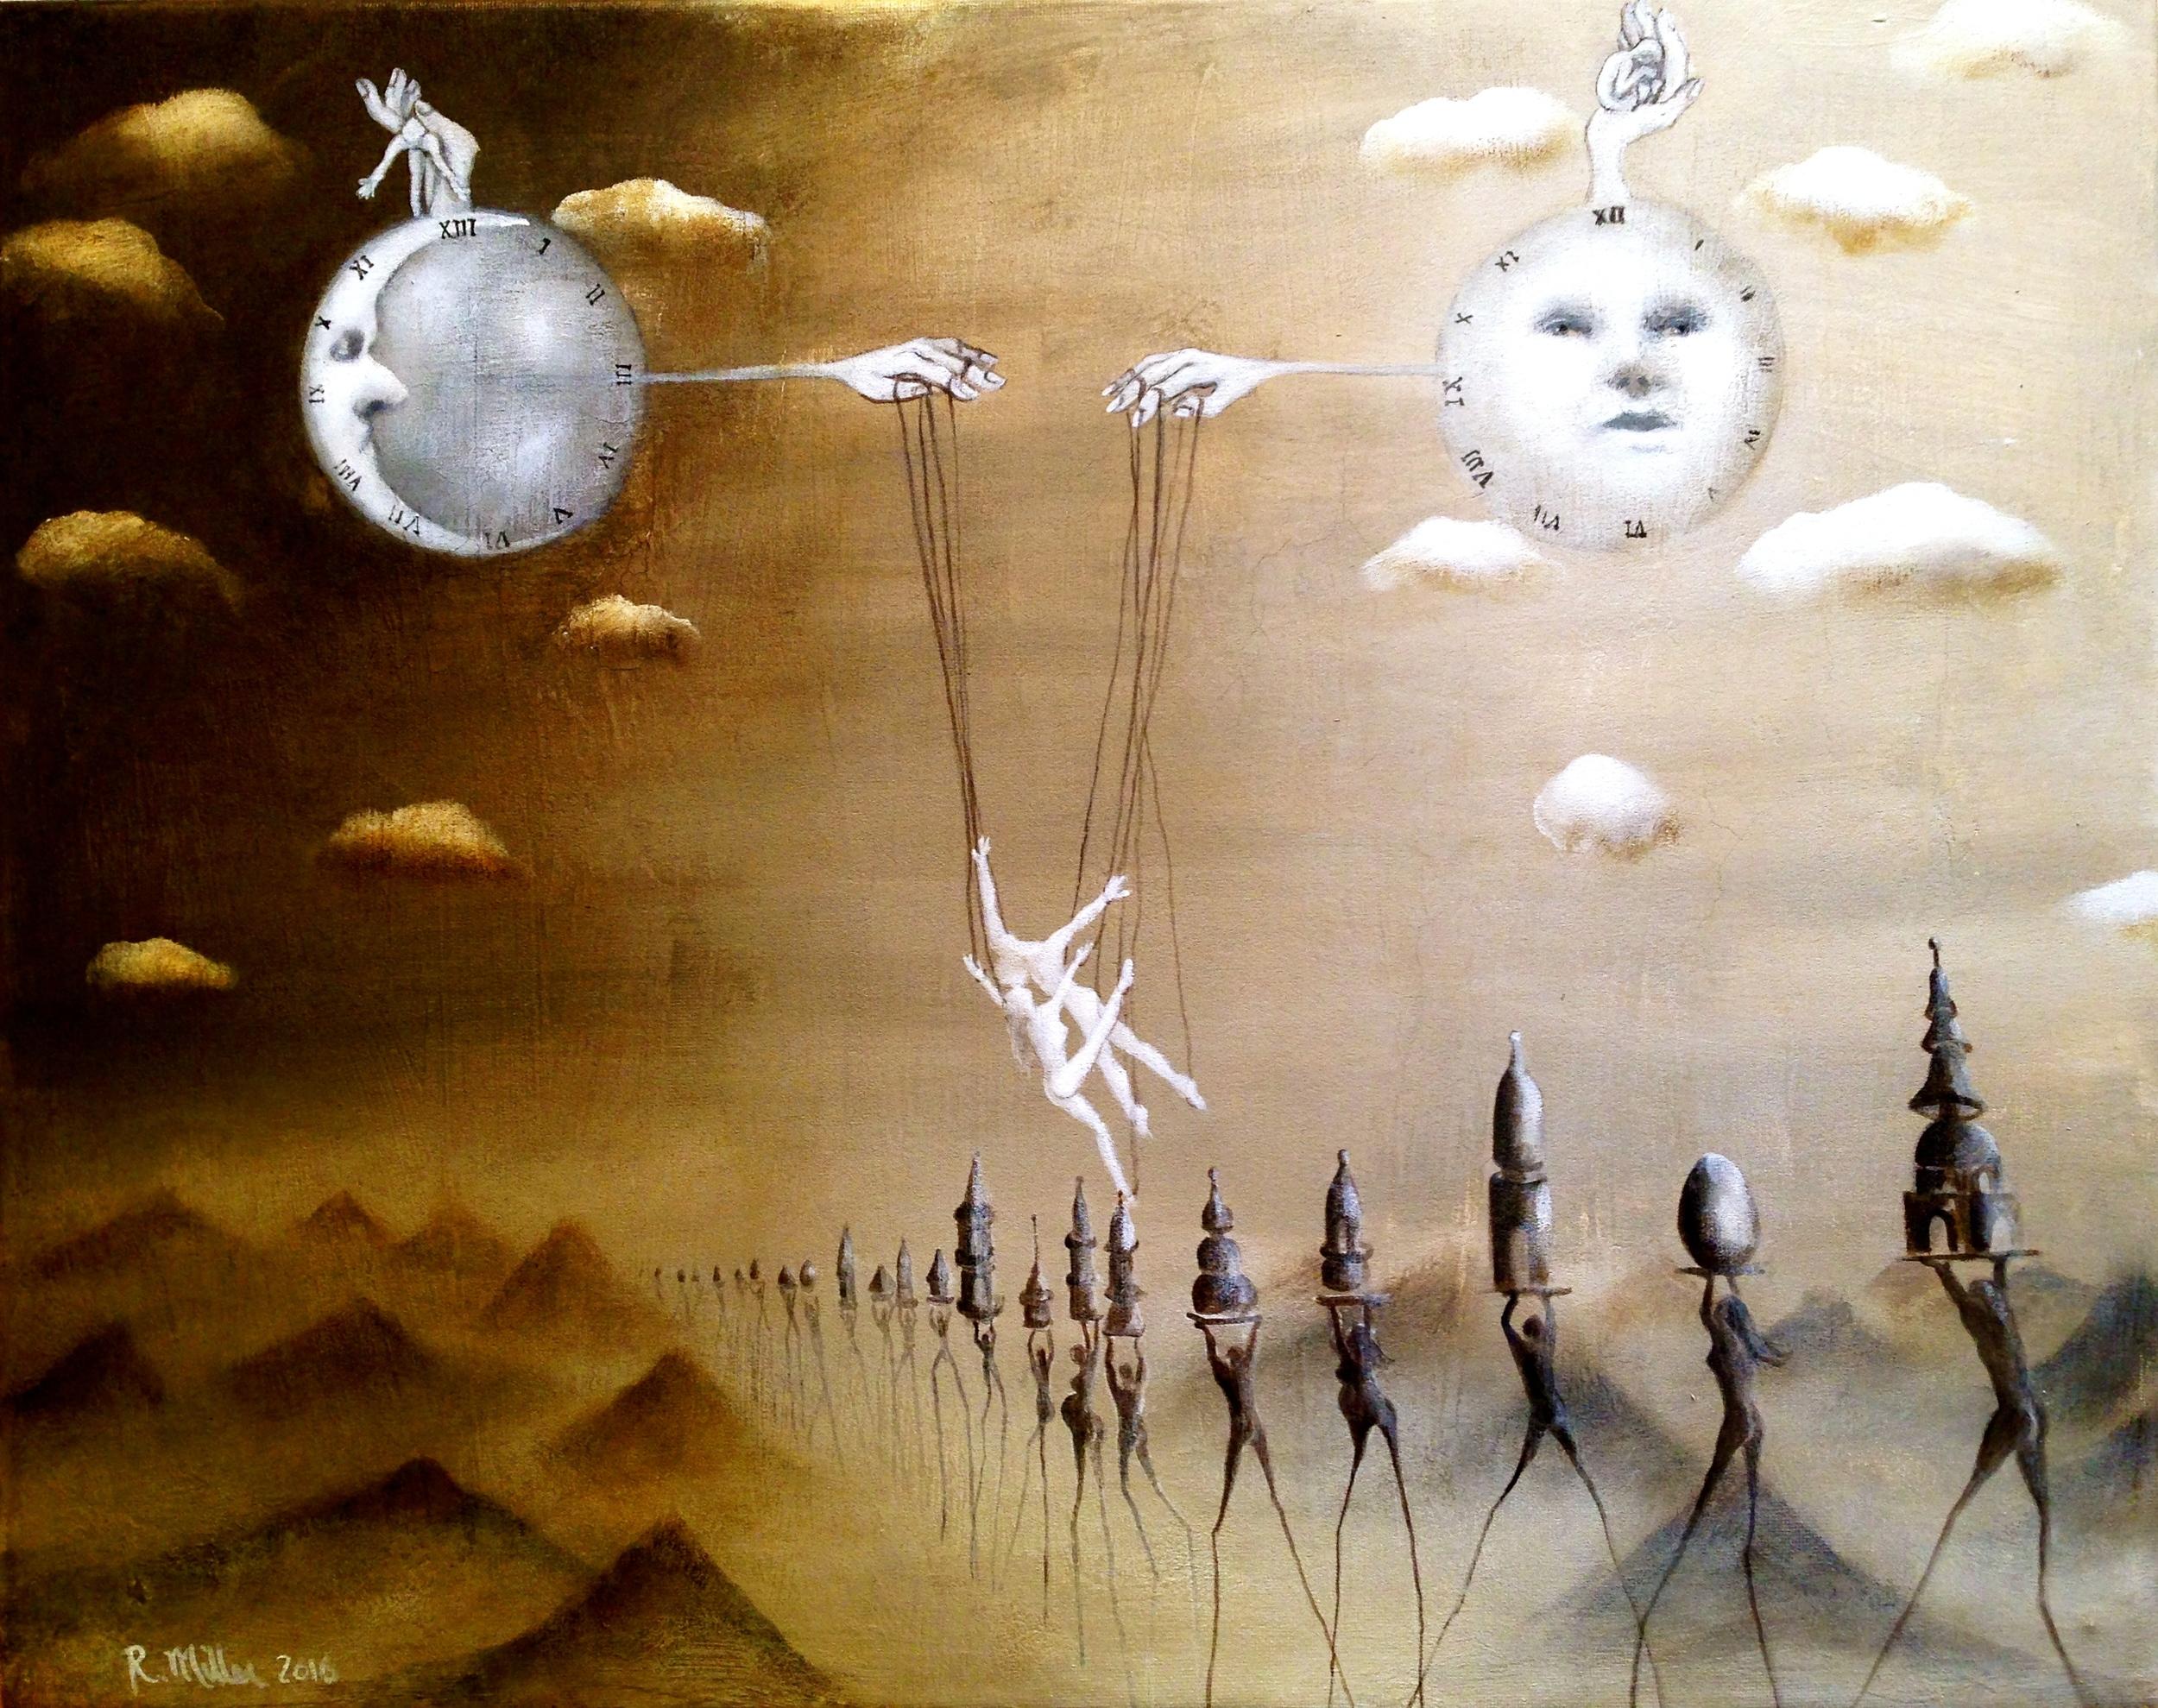 The Illusion, 2016   Acrylic, oil, & texture medium on canvas